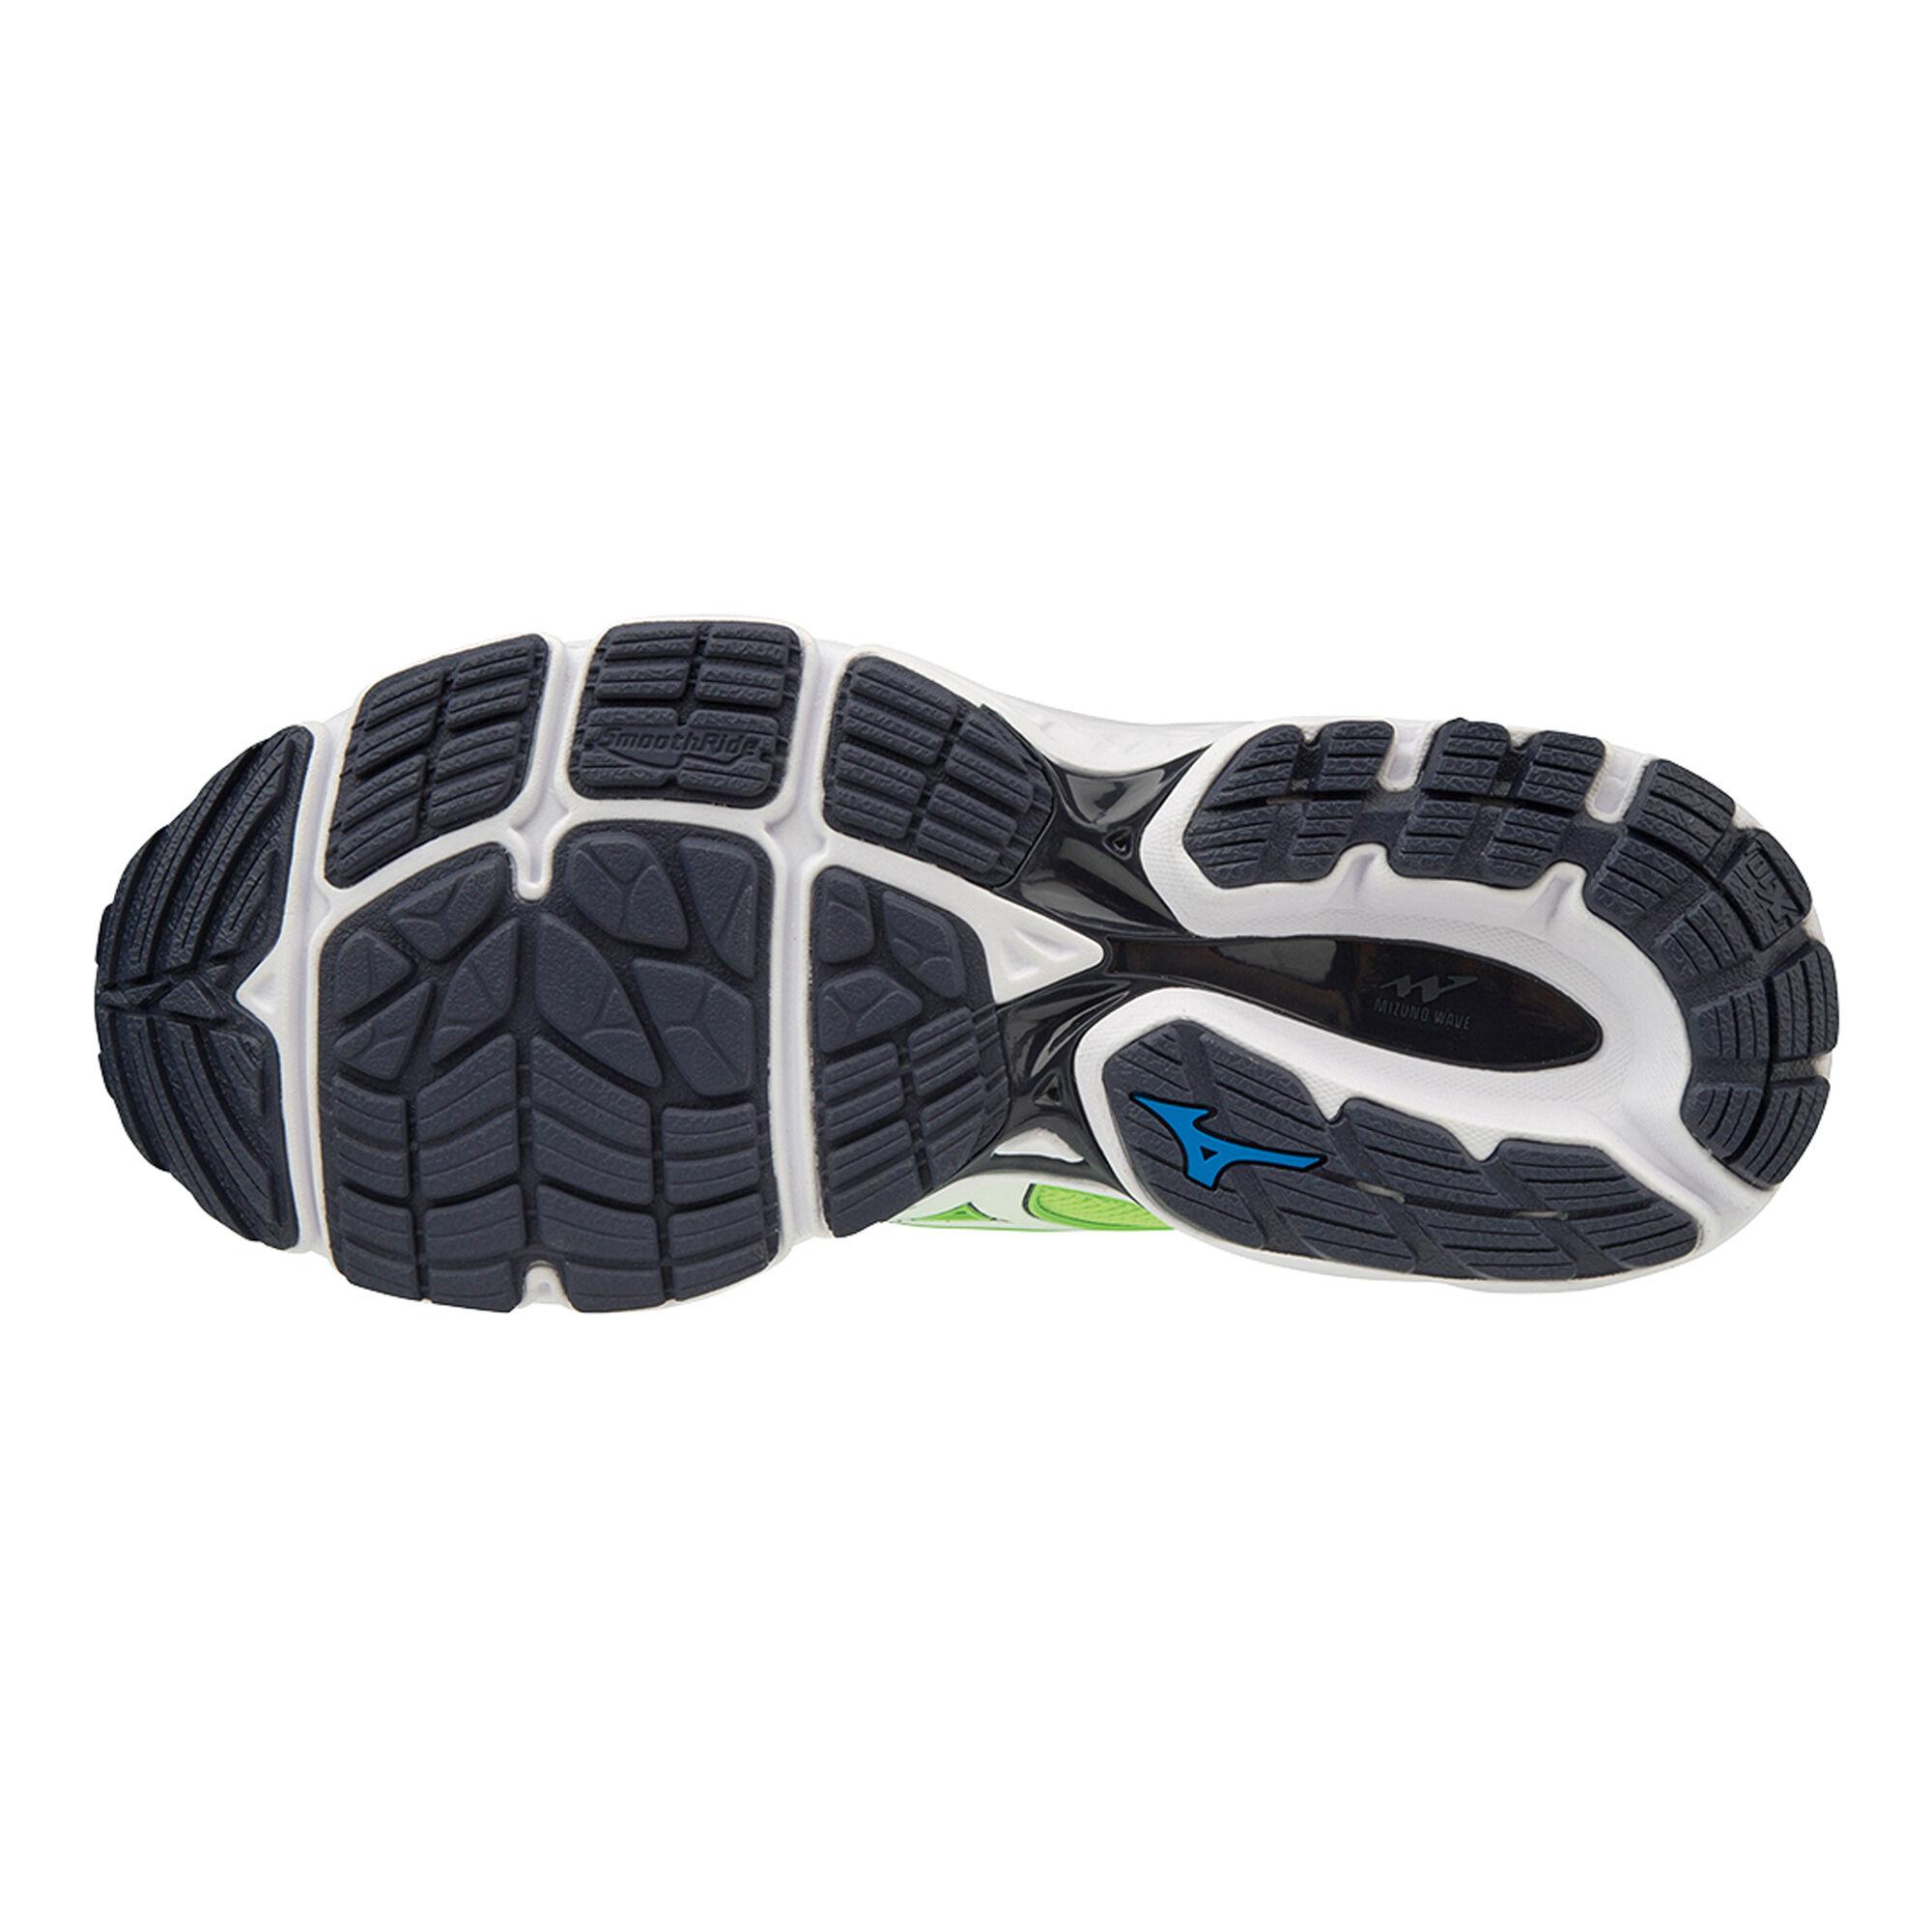 mens mizuno running shoes size 9.5 eu quiz